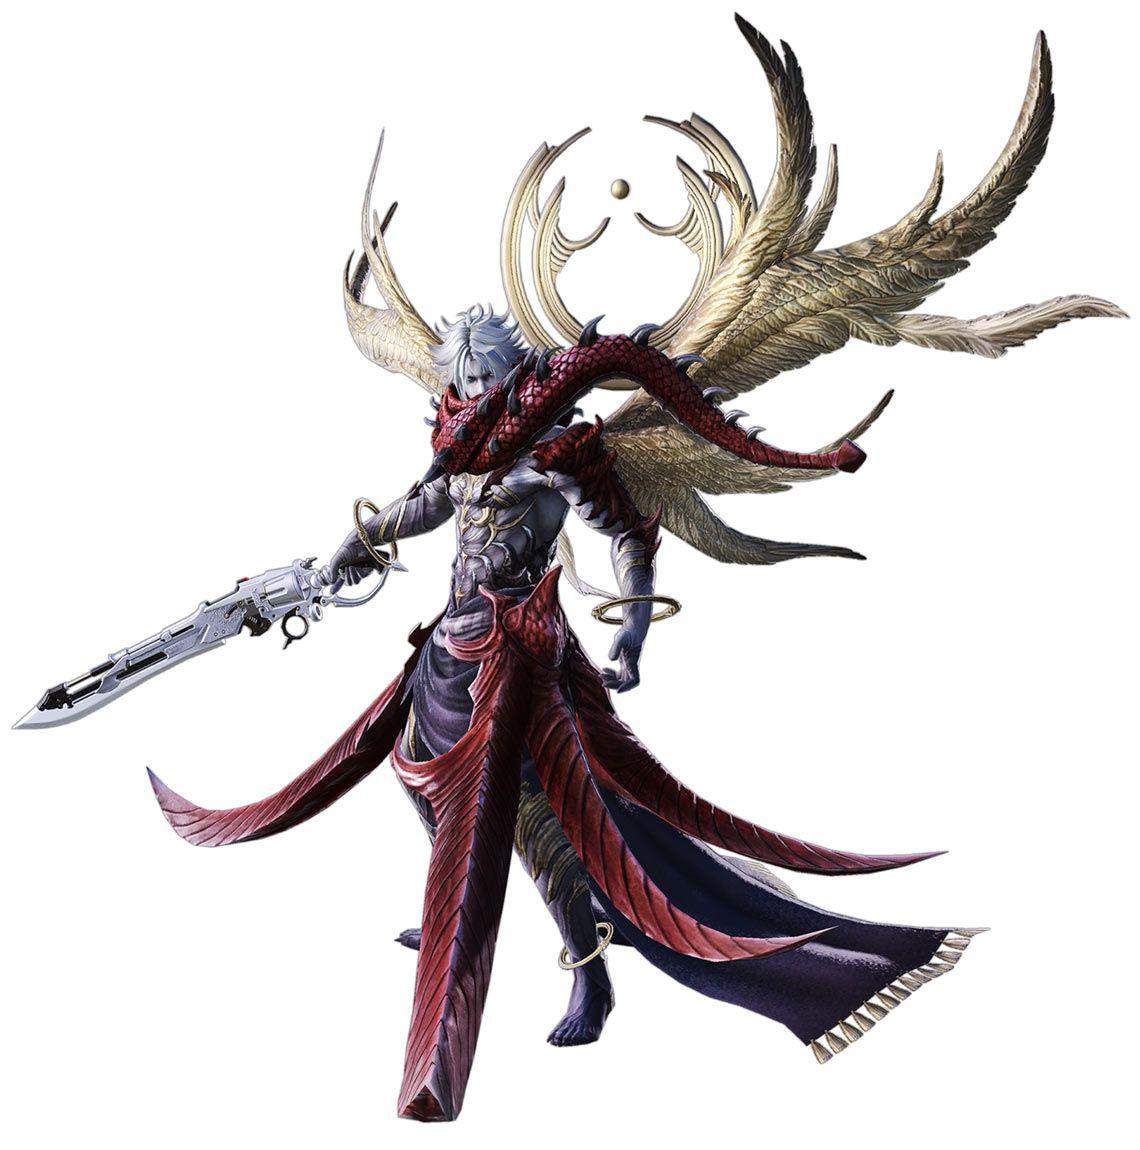 Eden S Promise Fatebreaker Art Final Fantasy Xiv Shadowbringers Art Gallery In 2021 Final Fantasy Xiv Final Fantasy Art Gallery